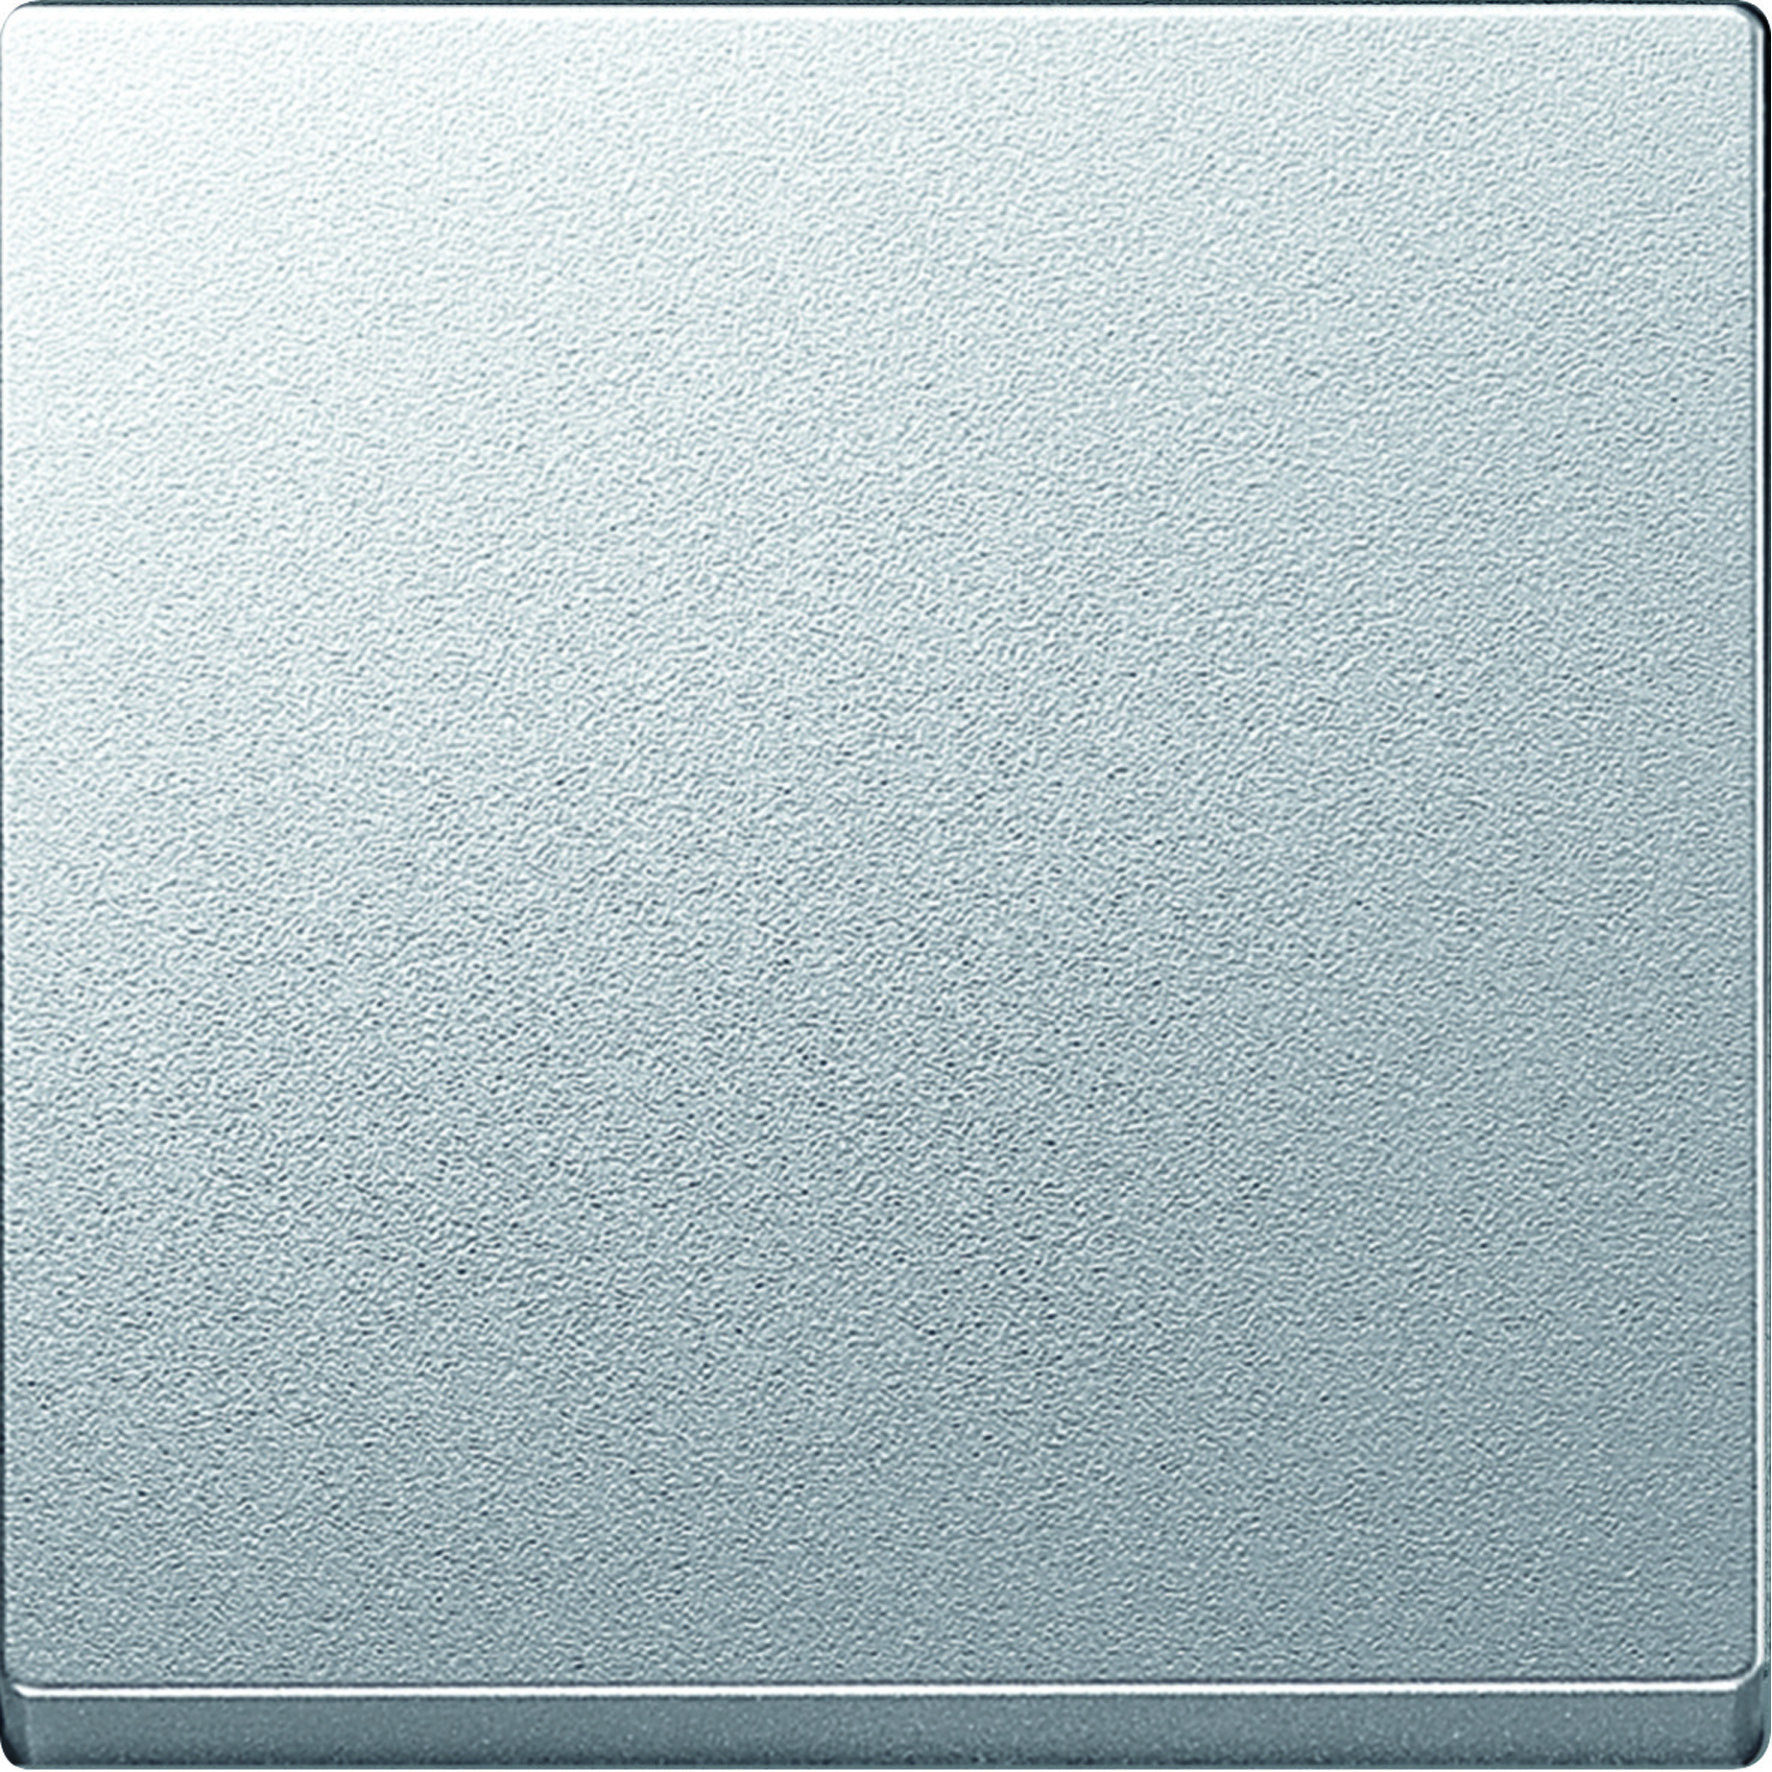 Schneider-Merten systeem M wip - aluminium (MTN433160)